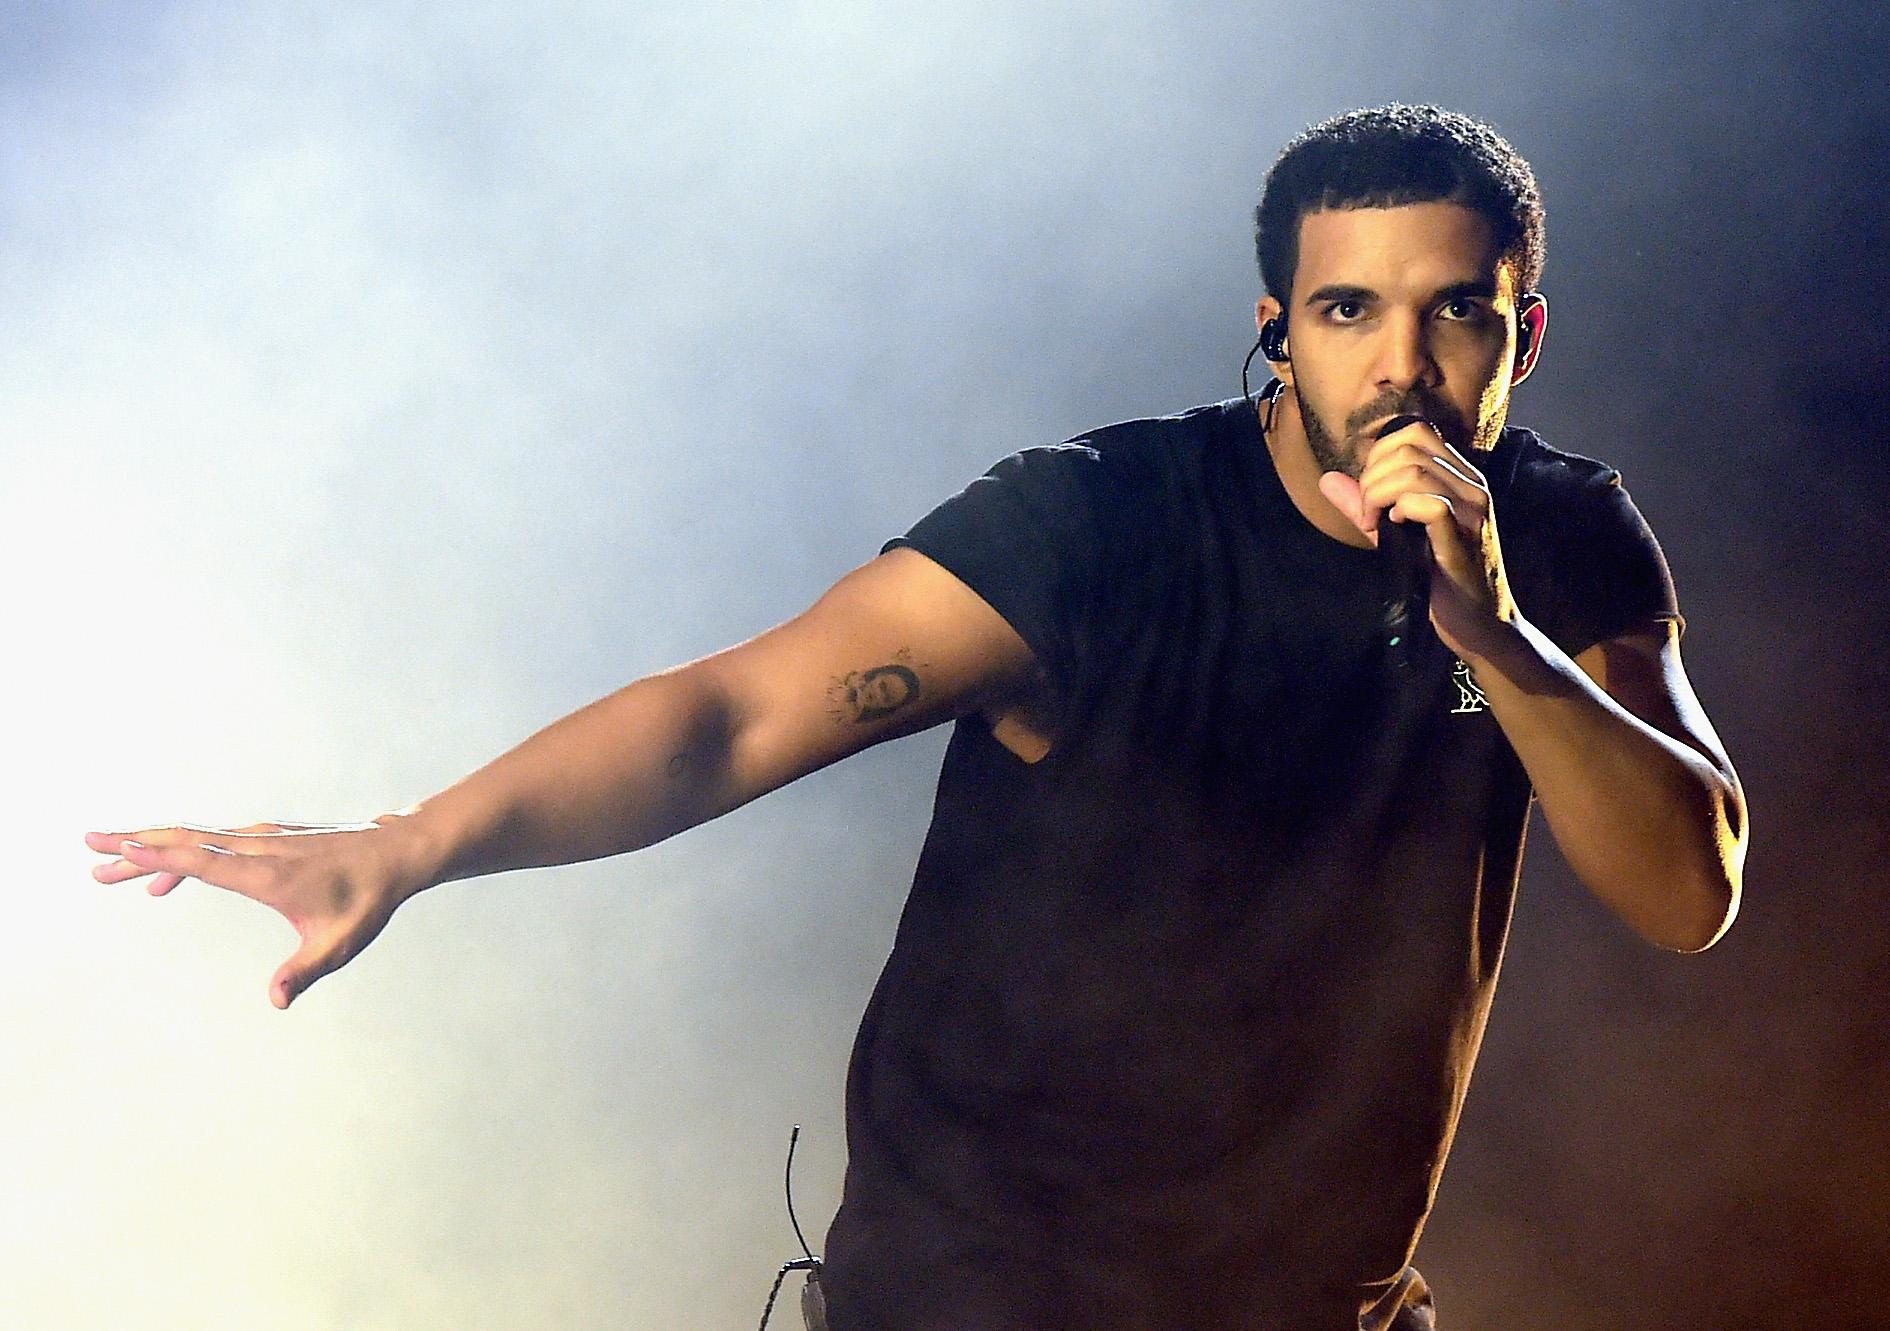 Drake is working on series 3 of Top Boy with Skepta